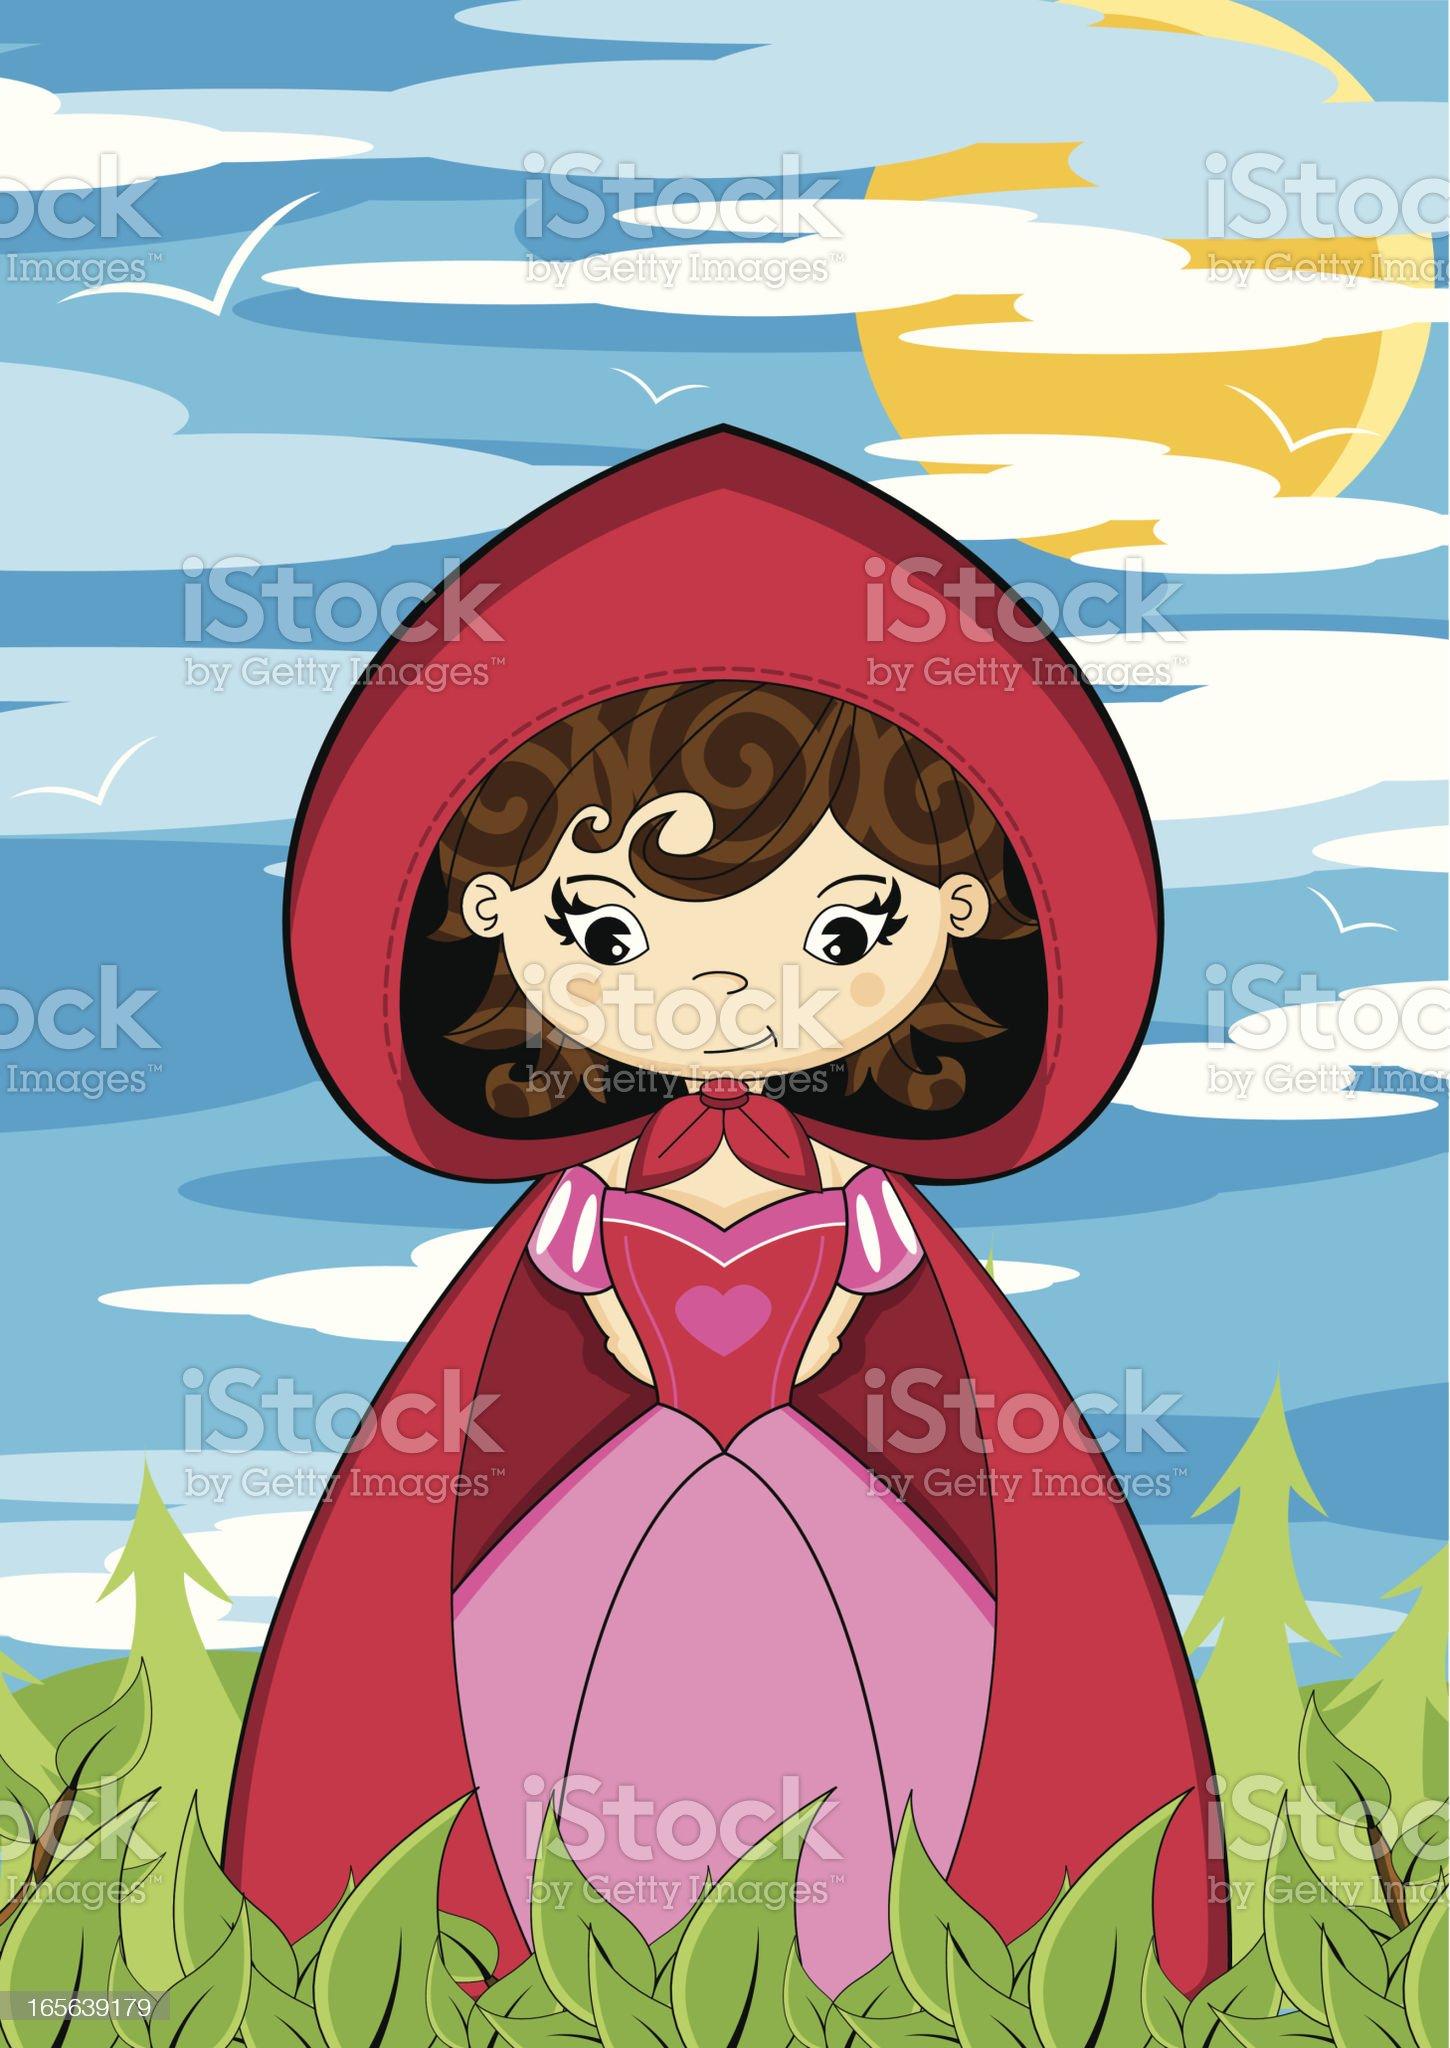 Cute Little Red Riding Hood Scene royalty-free stock vector art